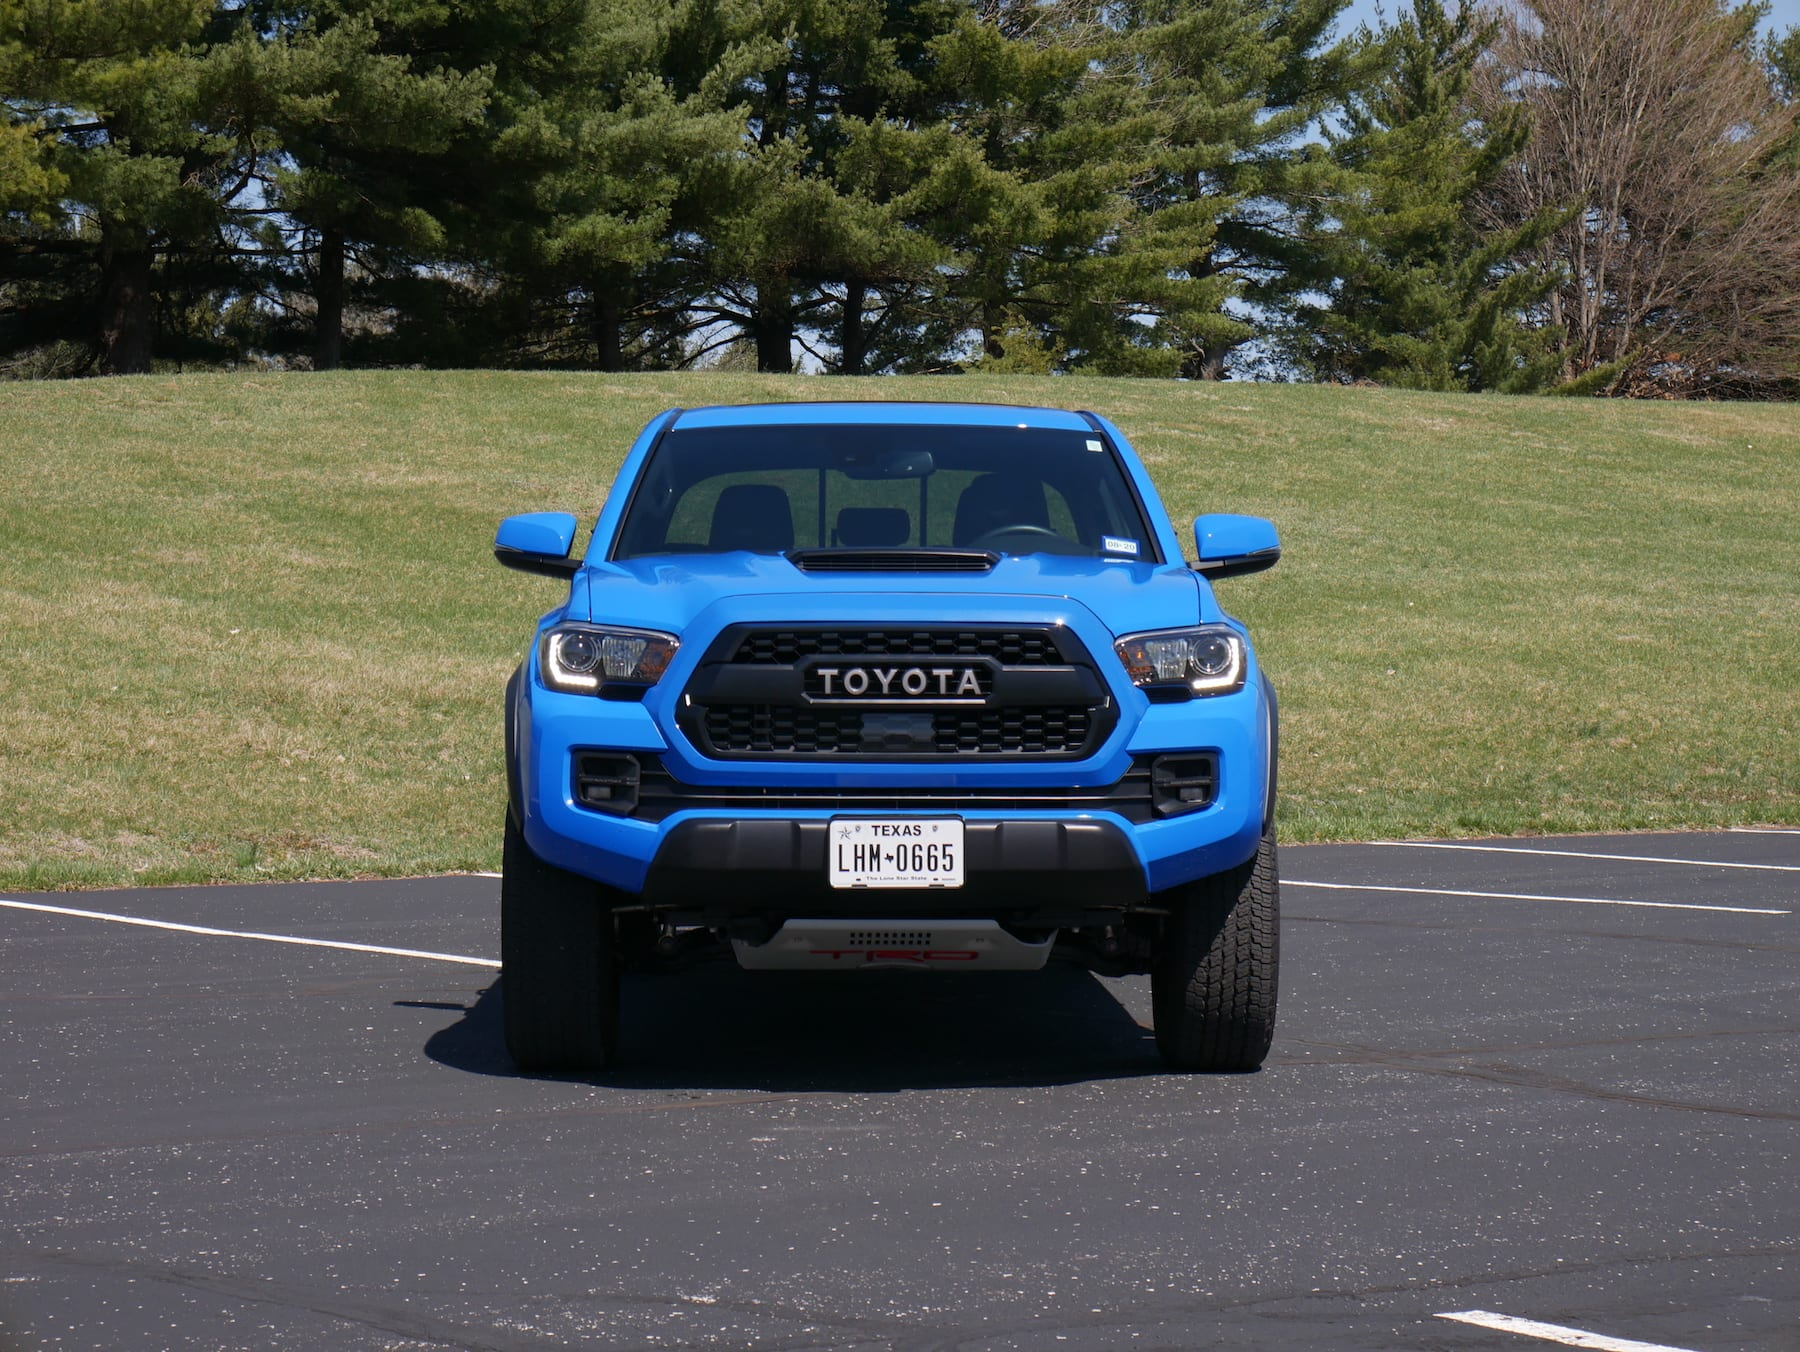 2019 Toyota Tacoma Trd Pro Review Gcbc